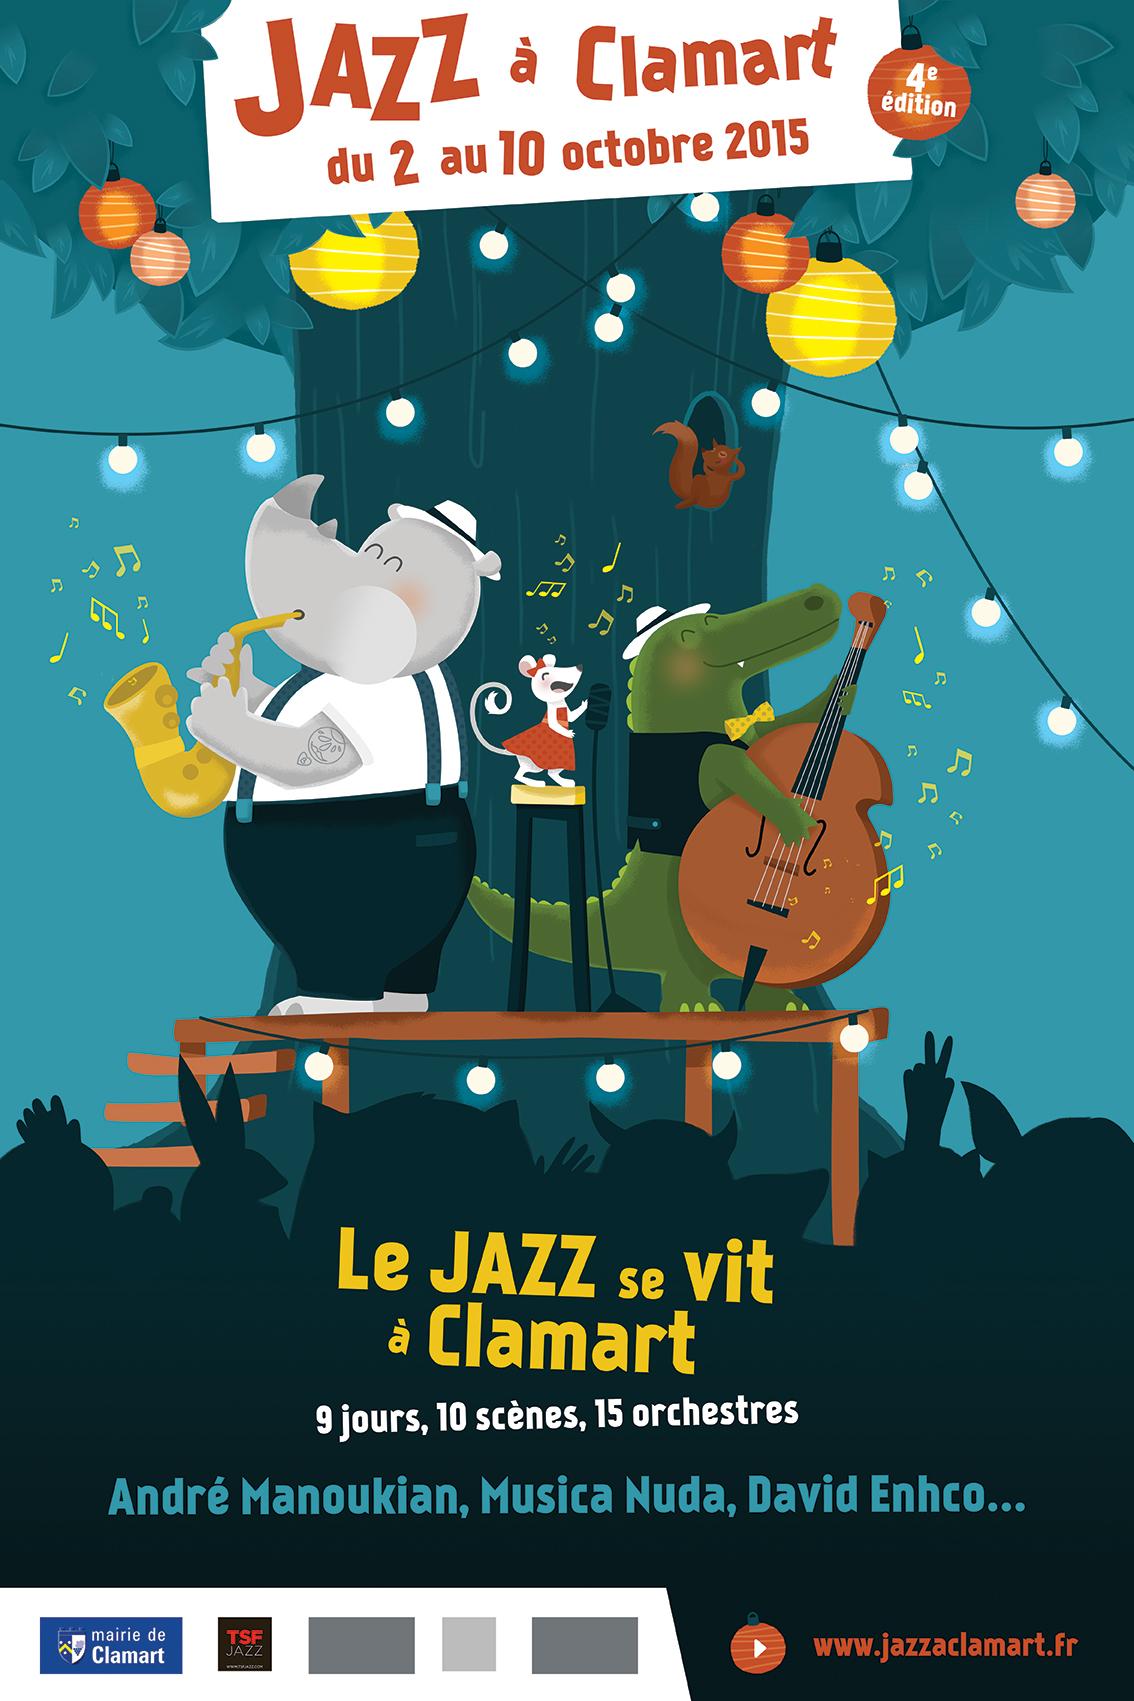 poster-jazz_clamart.jpg